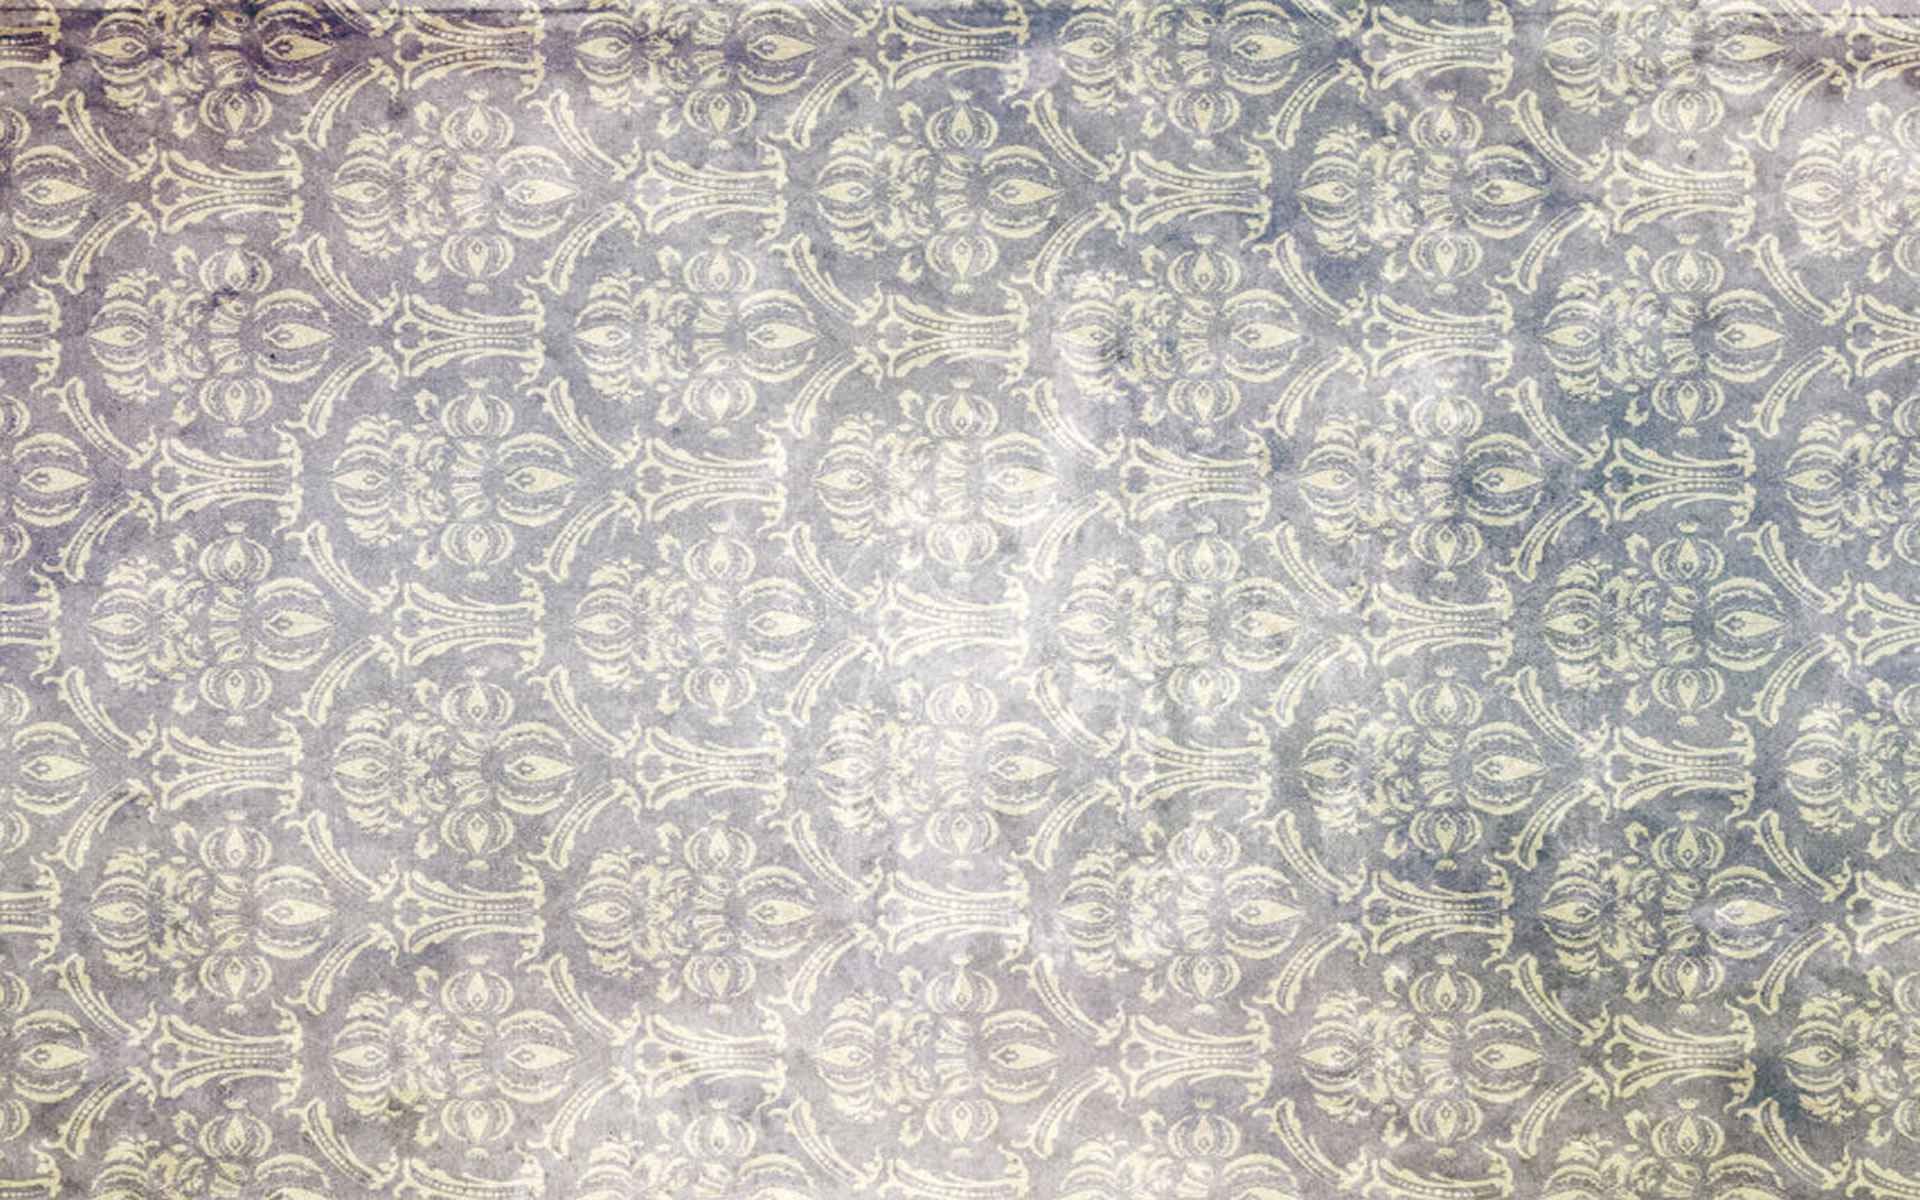 Assassins Creed 2 Hd Wallpapers Textura Vintage Wallpapers